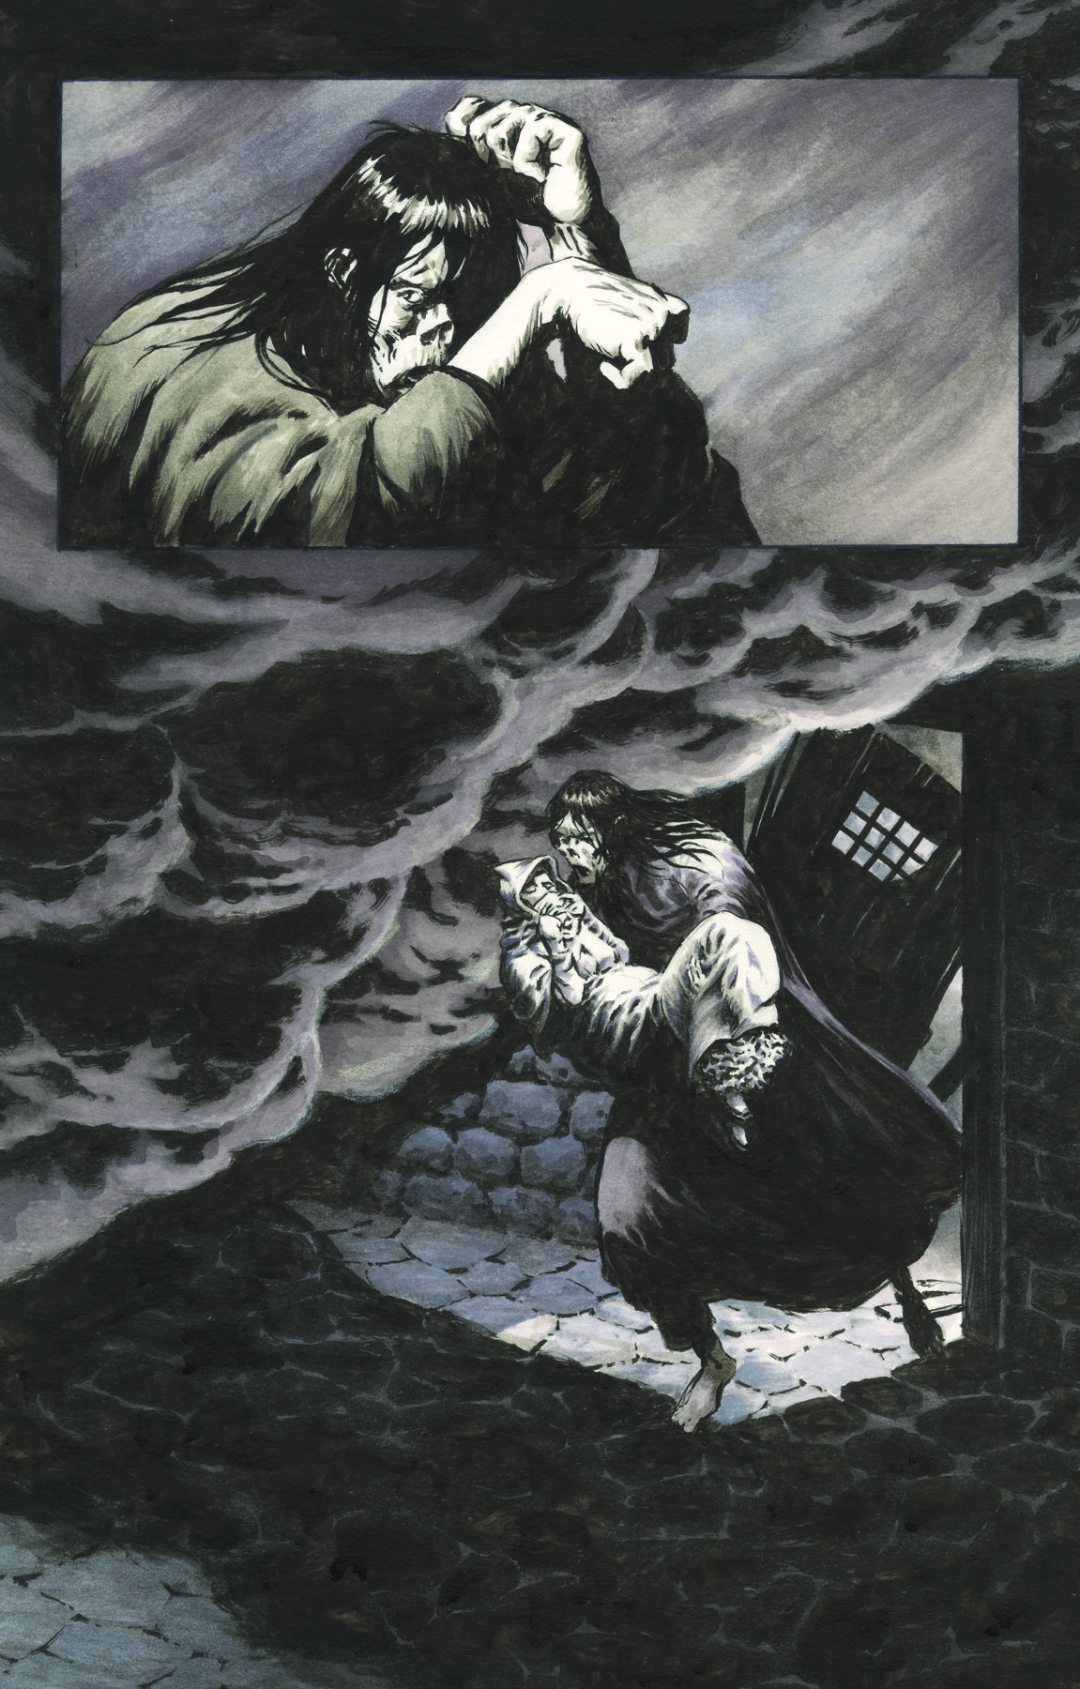 Steve Niles and Bernie Wrightson's 'Frankenstein, Alive, Alive' Returns